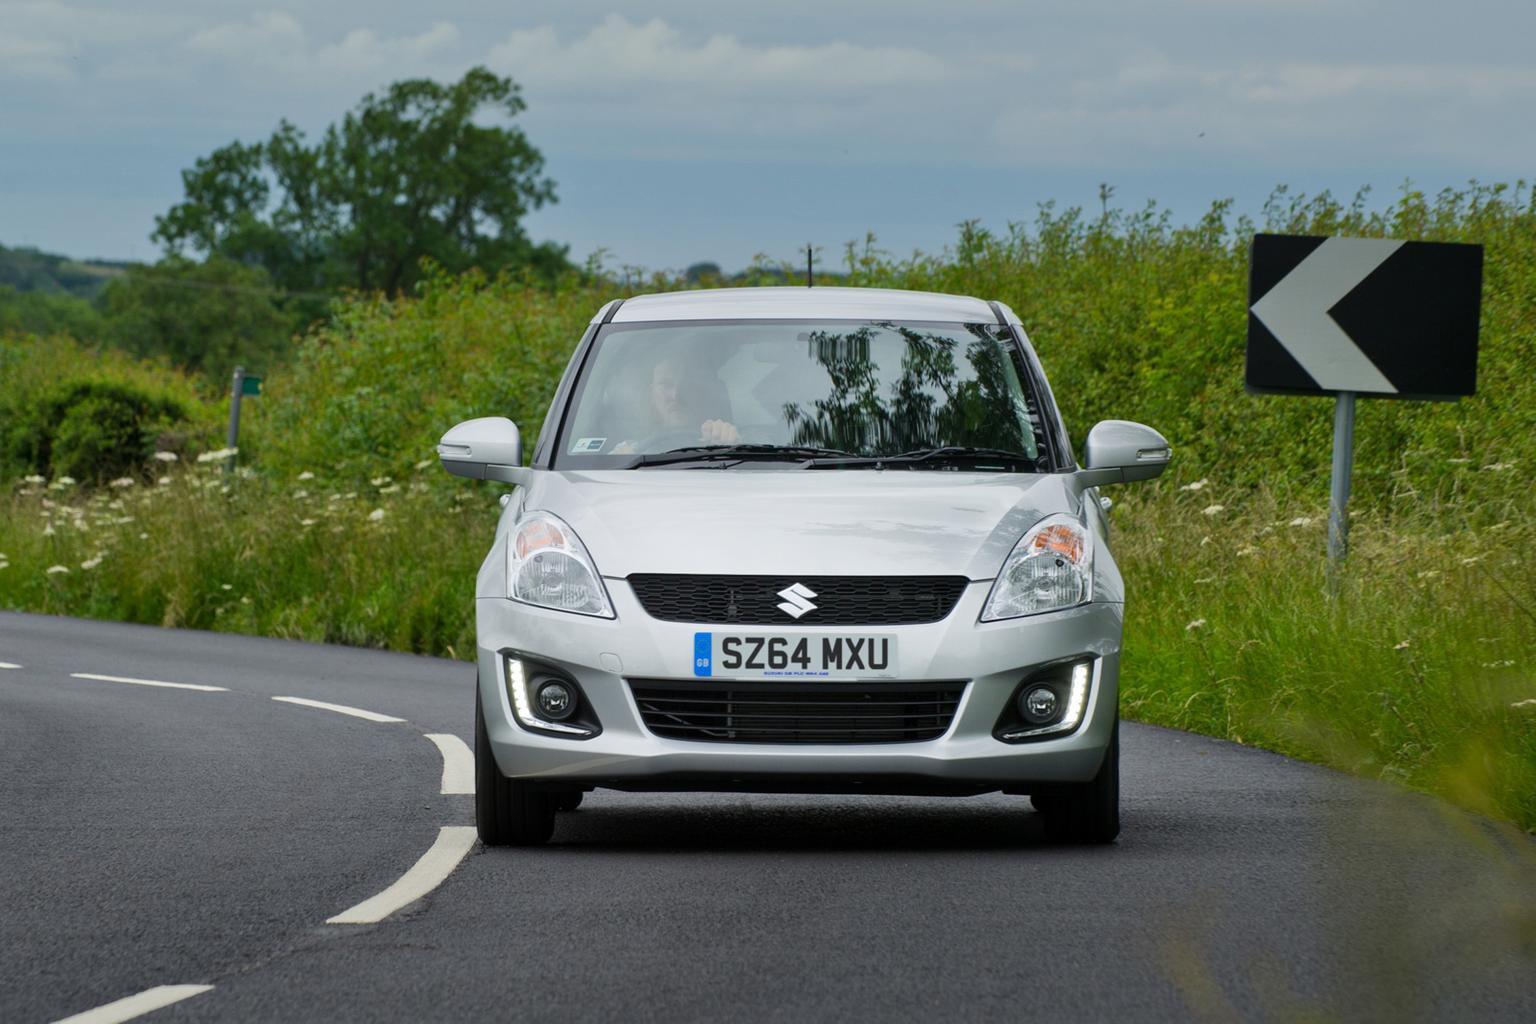 News round-up: new Vauxhall and Suzuki engines; Ssangyong Xiv Paris concepts